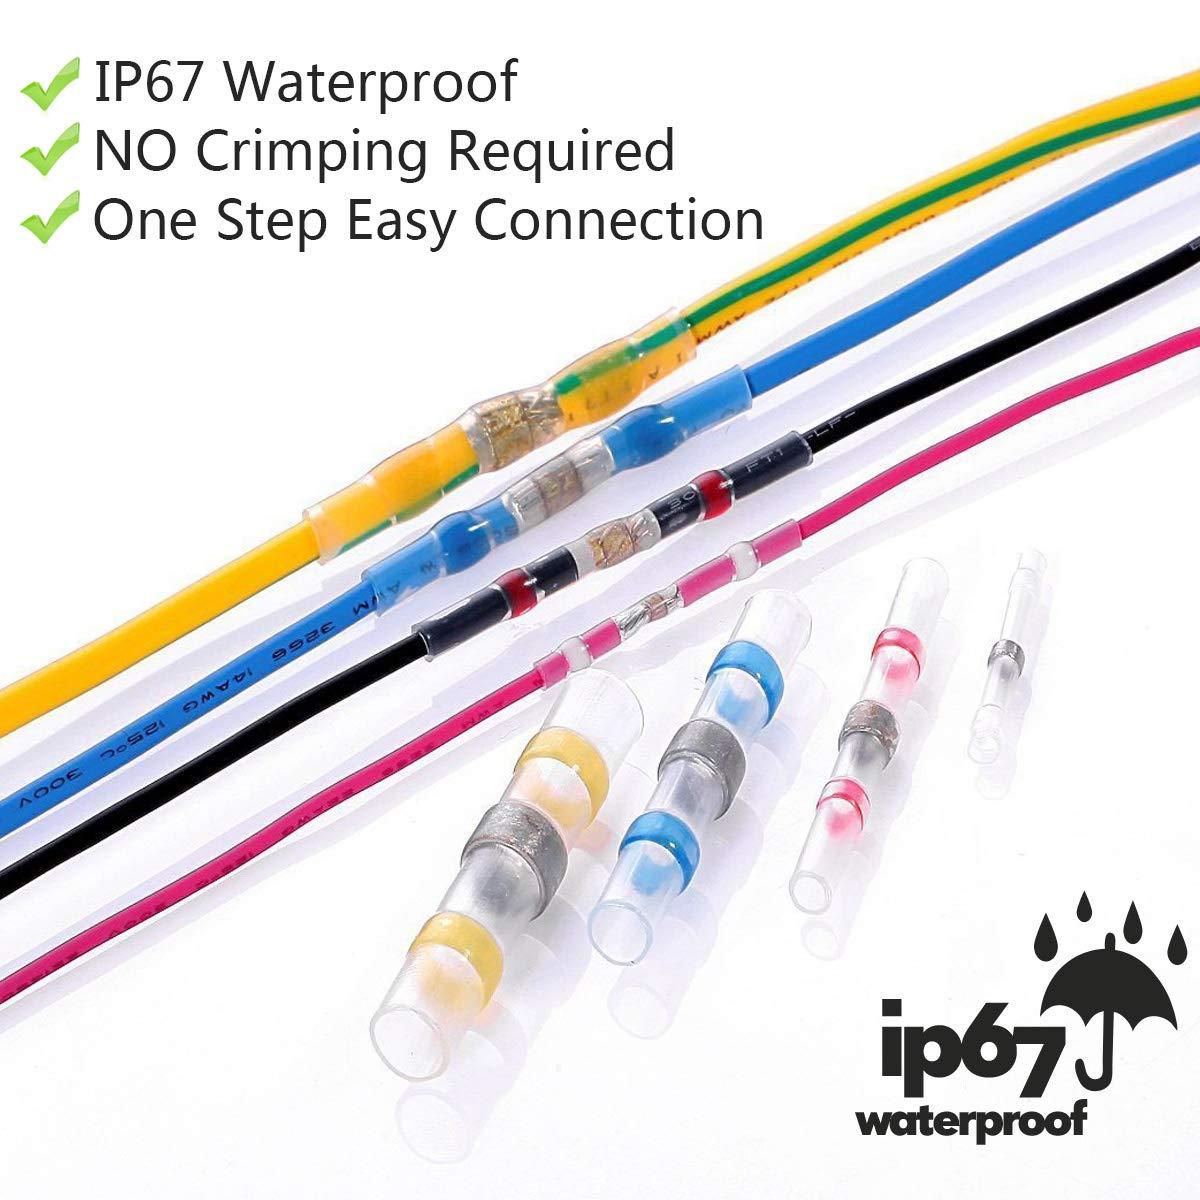 220PCS Solder Seal Wire Connectors - Sopoby Heat Shrink Connectors on